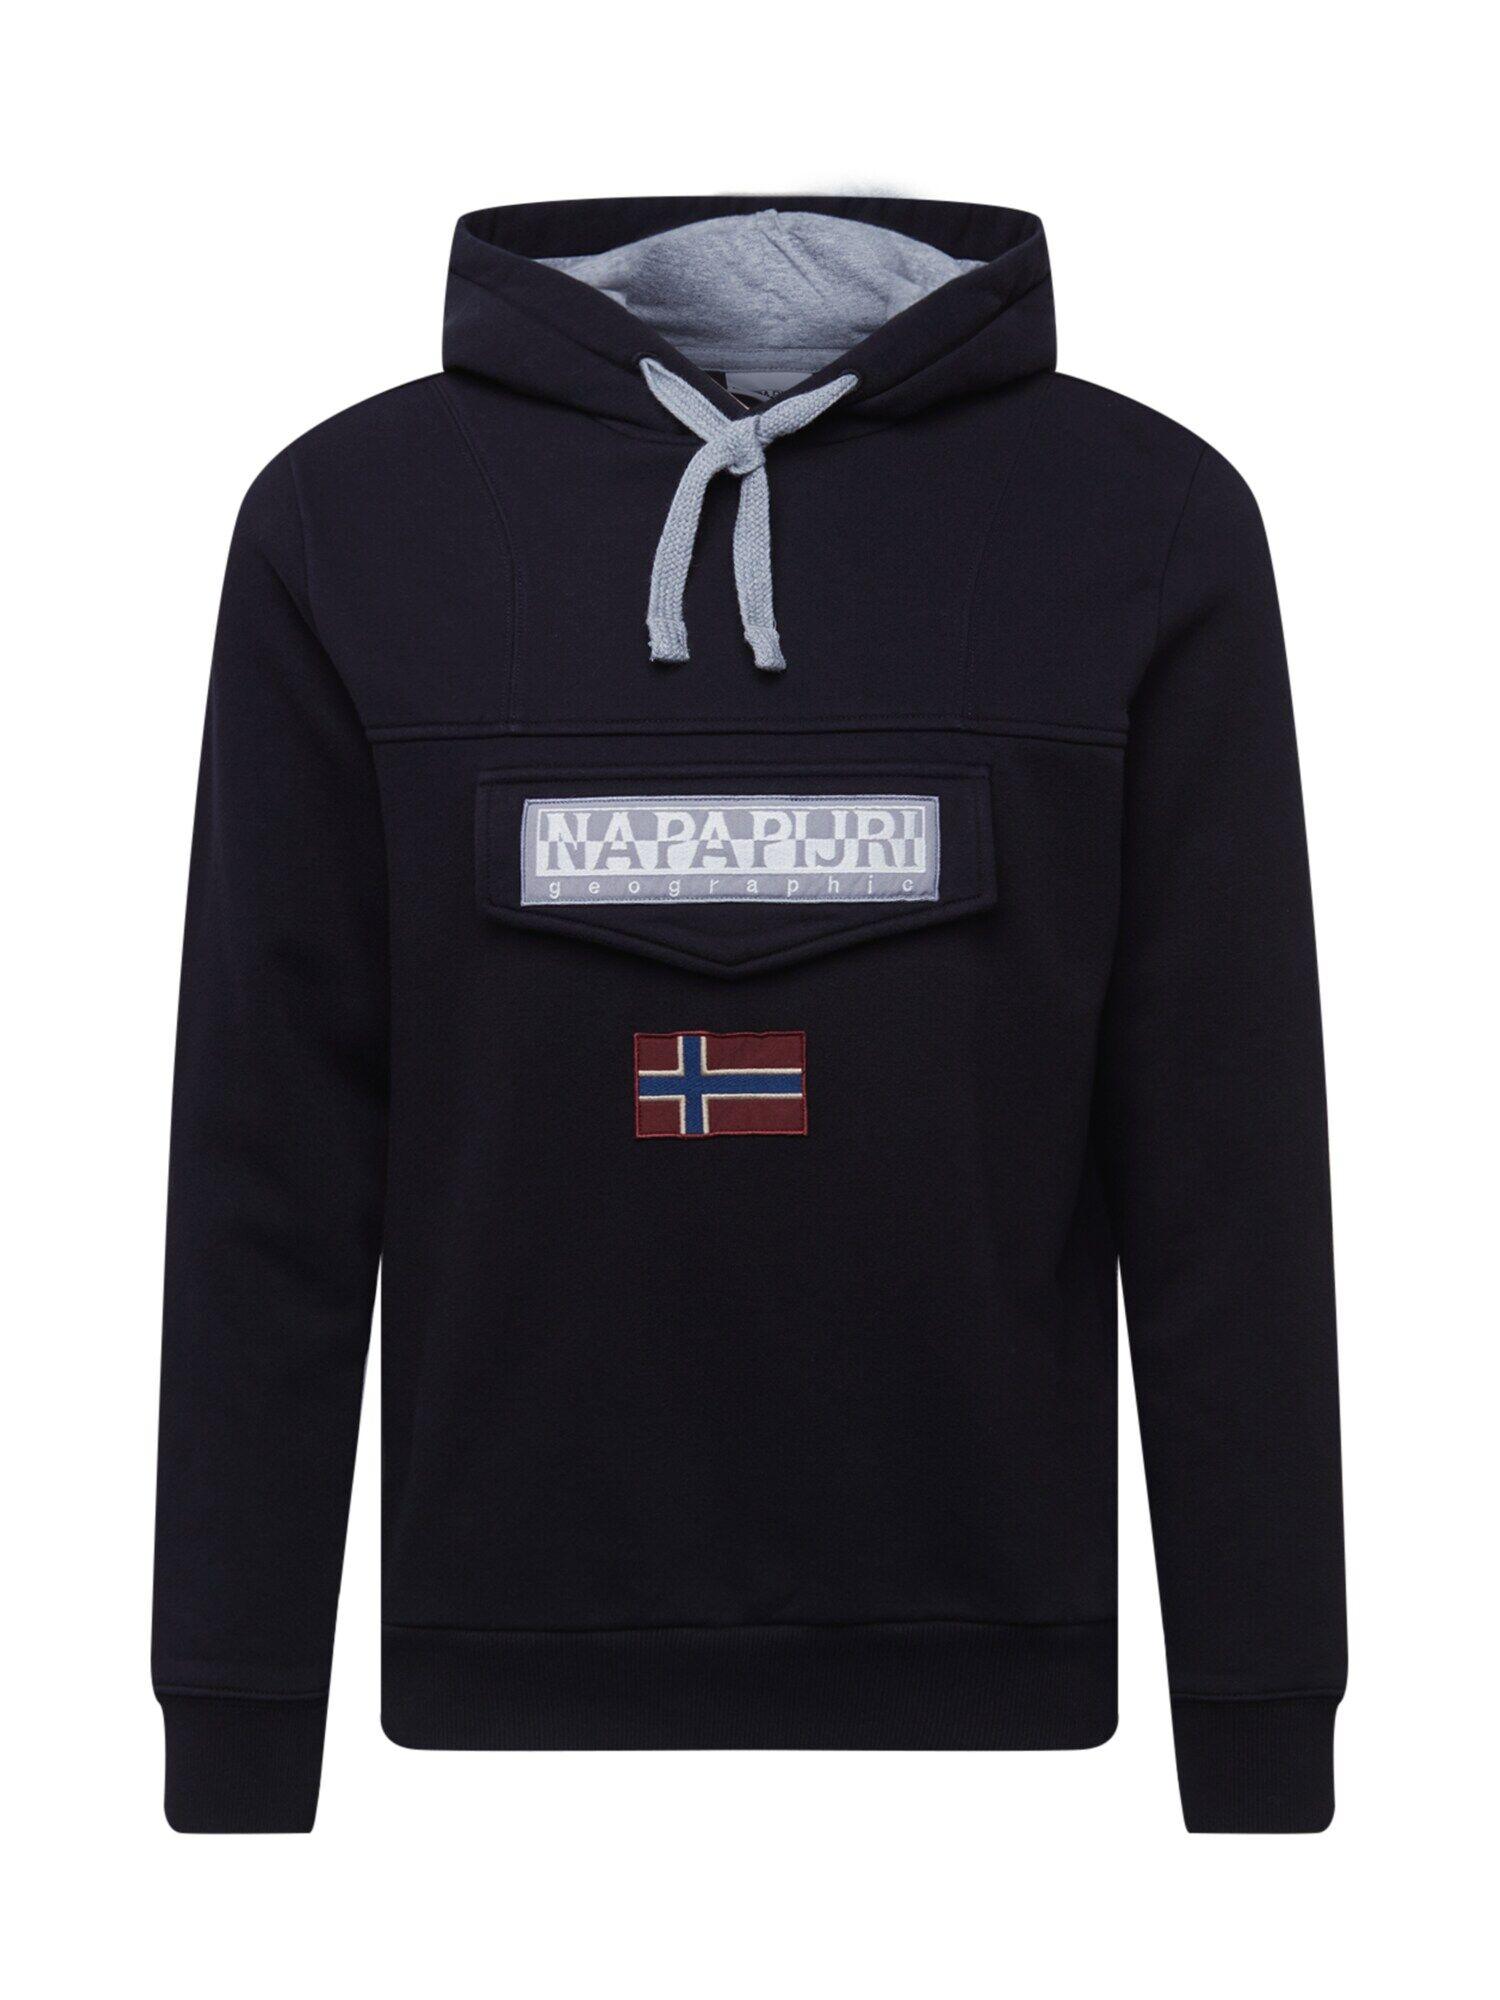 NAPAPIJRI Sweat-shirt 'Burgee'  - Noir - Taille: XXL - male